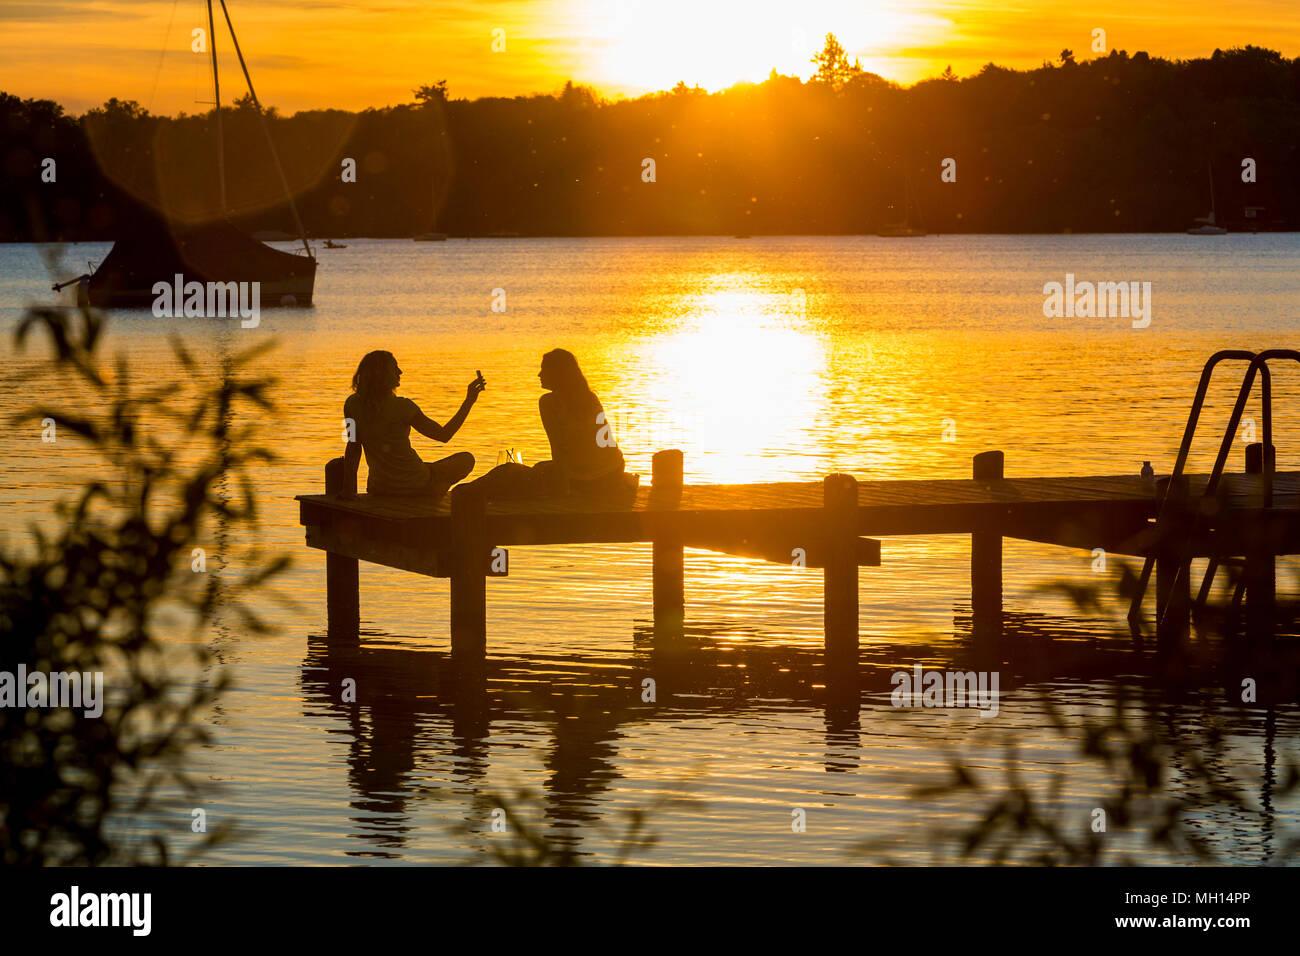 Zwei Frauen am See geniessen den Sonnenuntergang - Stock Image